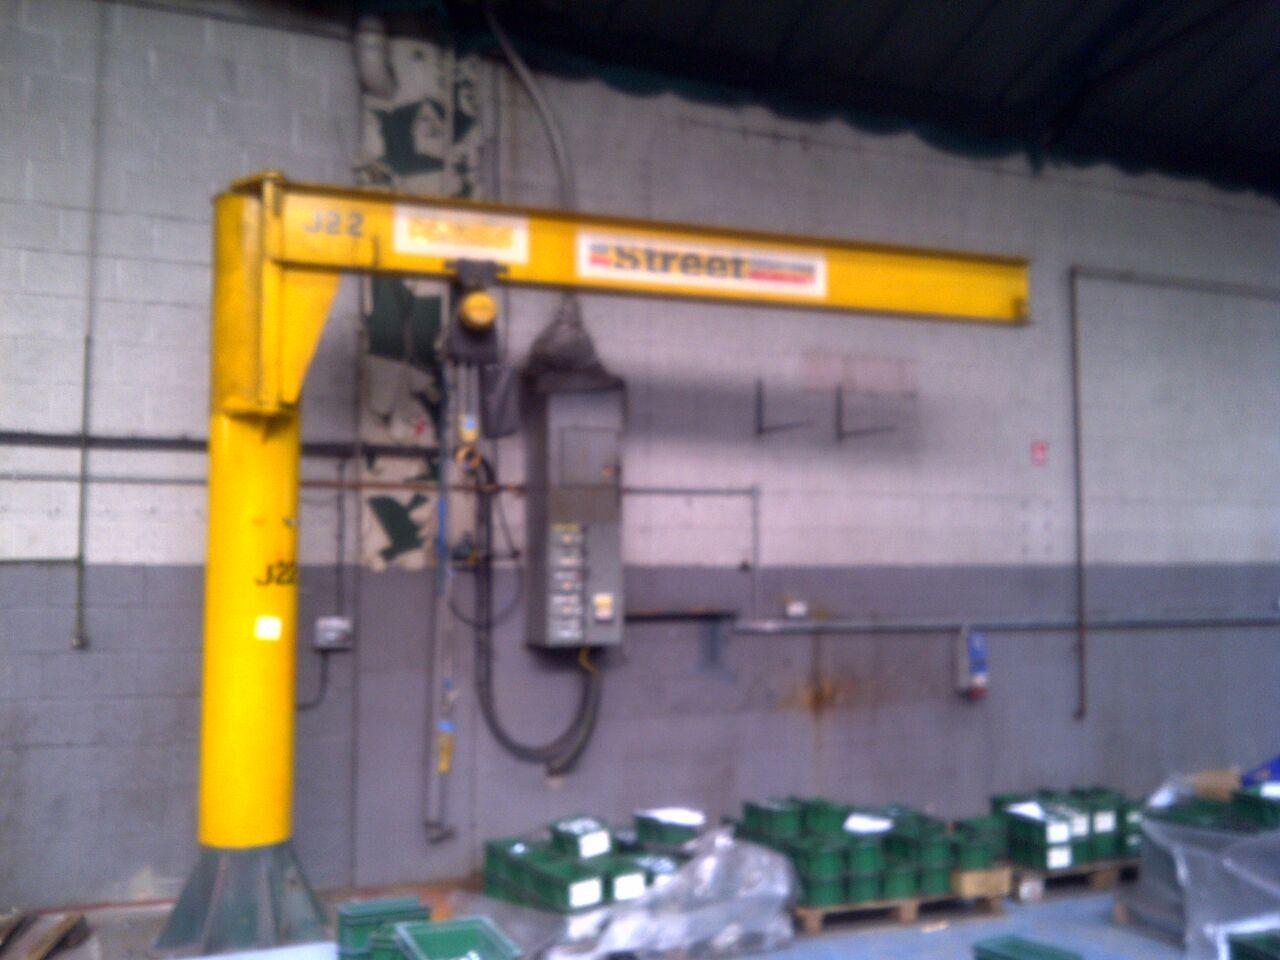 hight resolution of kone crane parts hoist kone cranes controls wiring diagram detroit